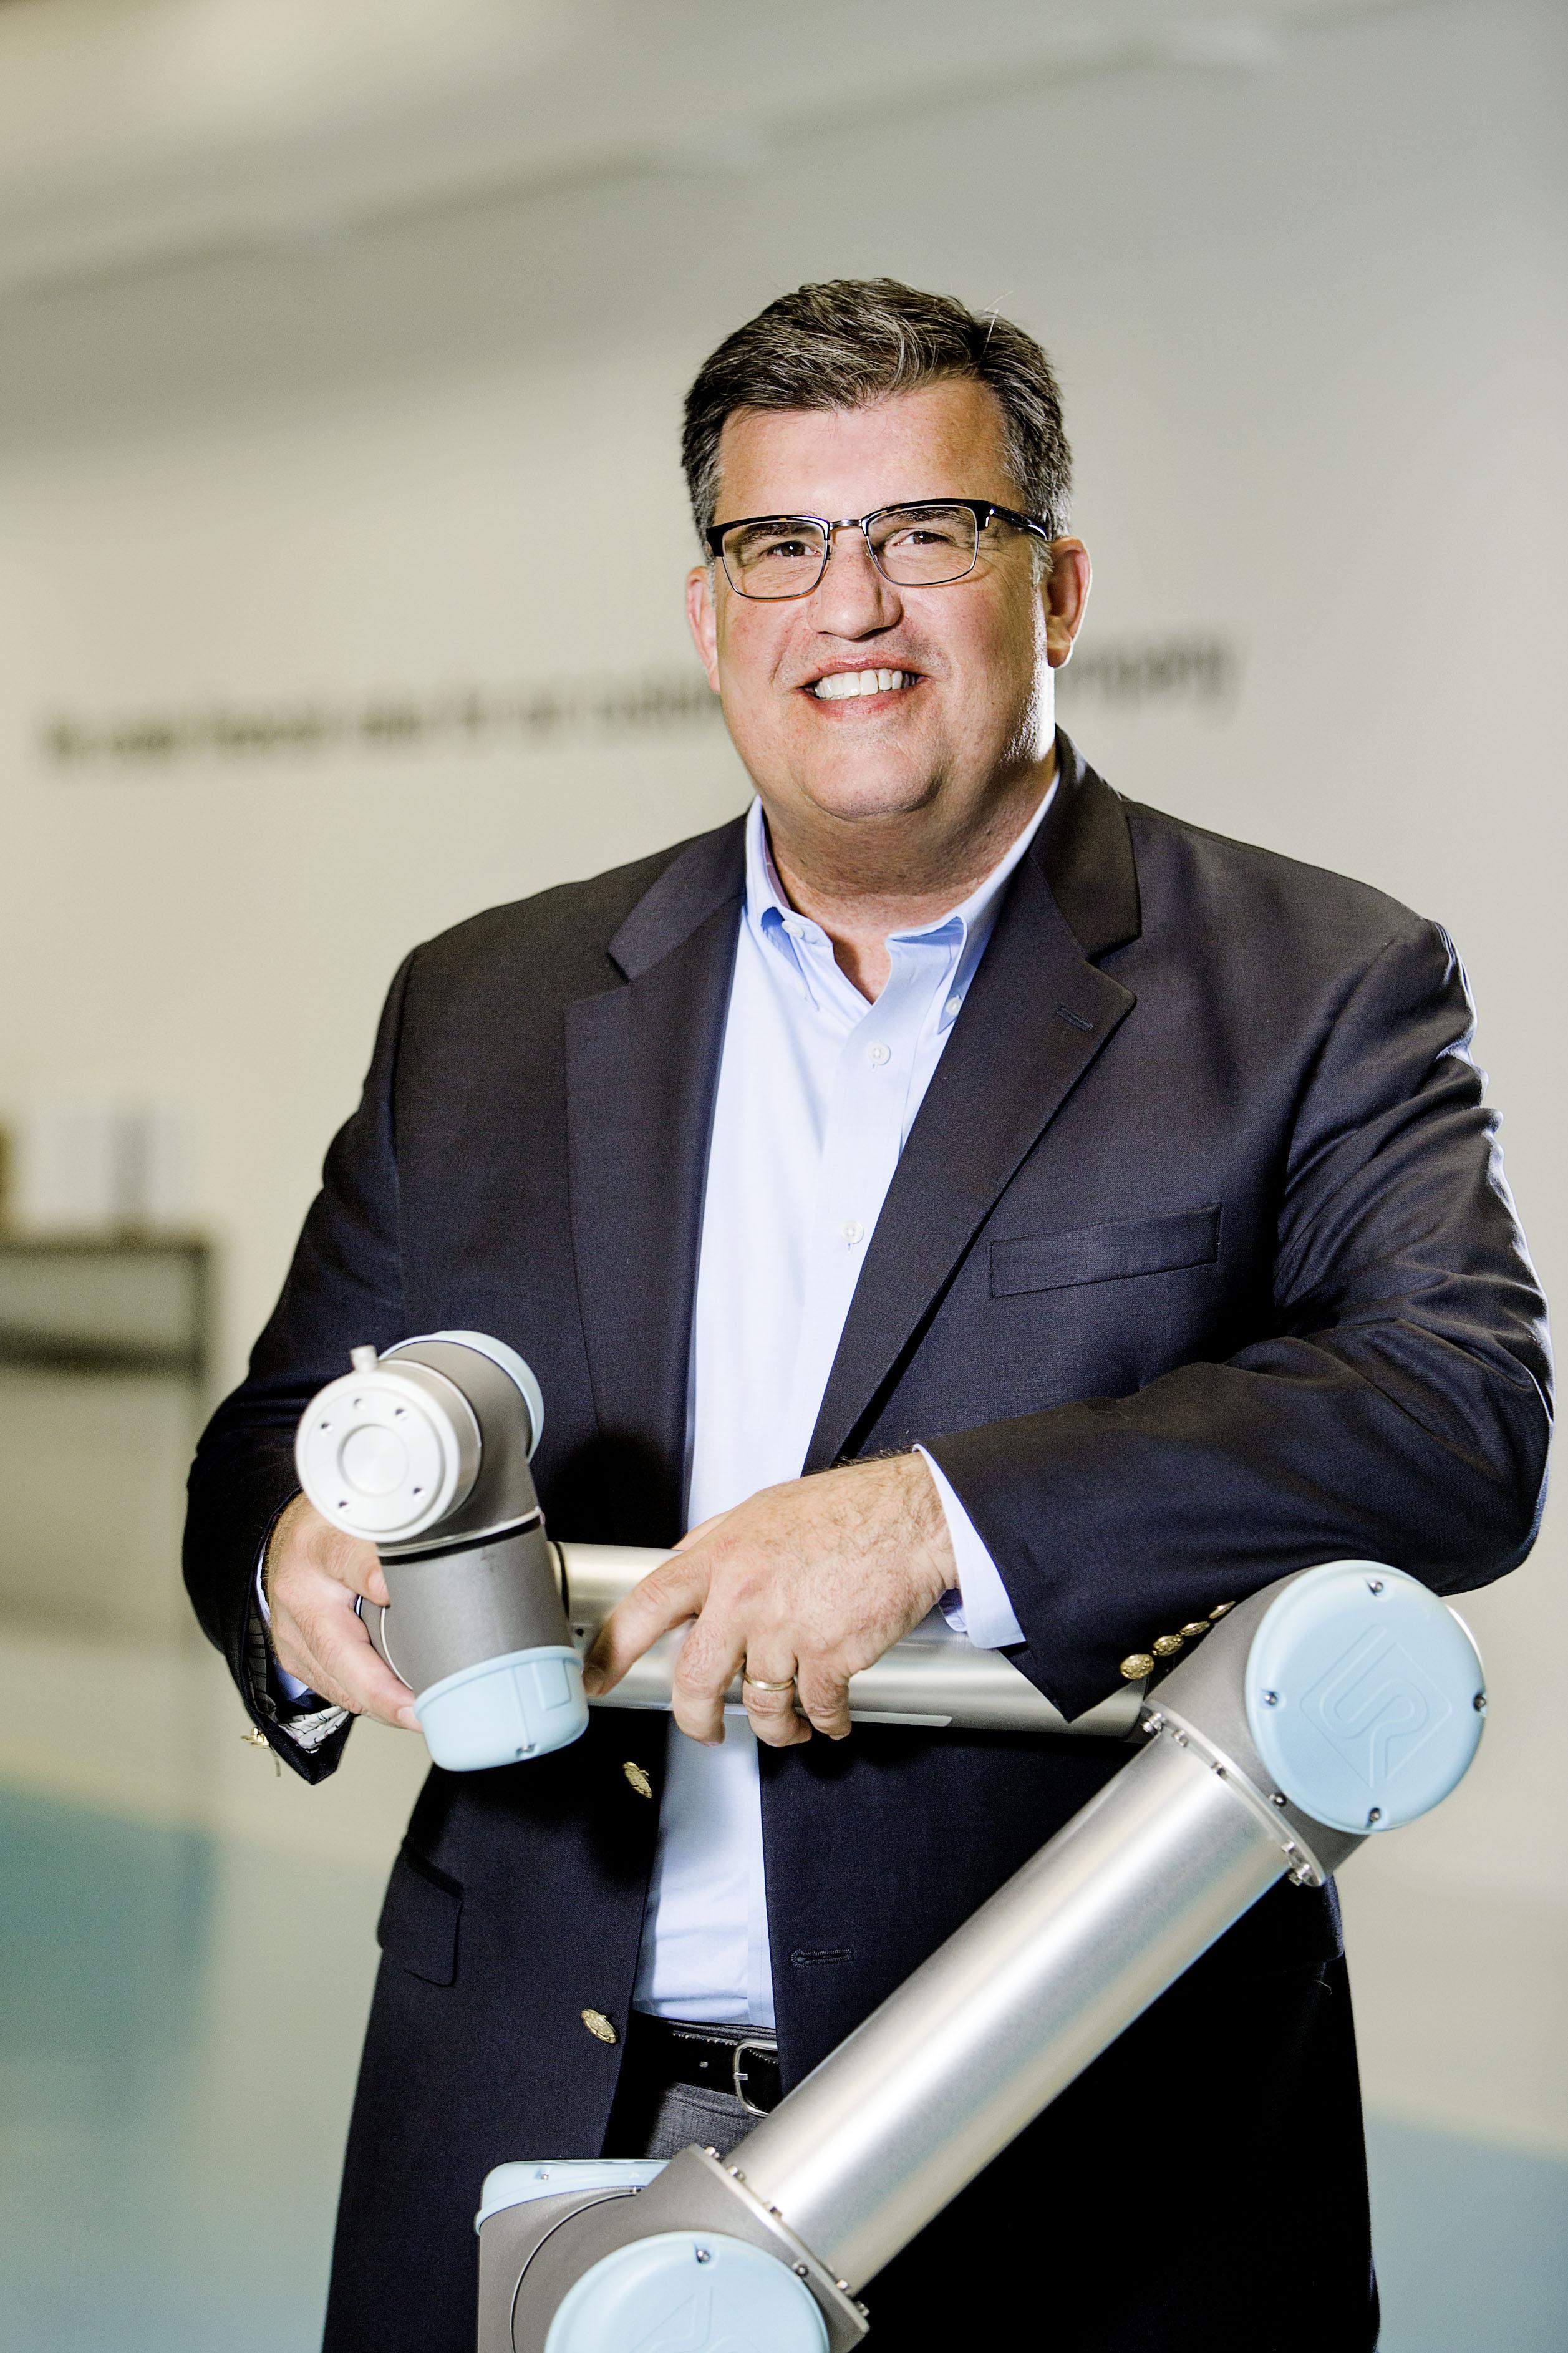 Scott Mabie, general manager, Americas division, Universal Robots